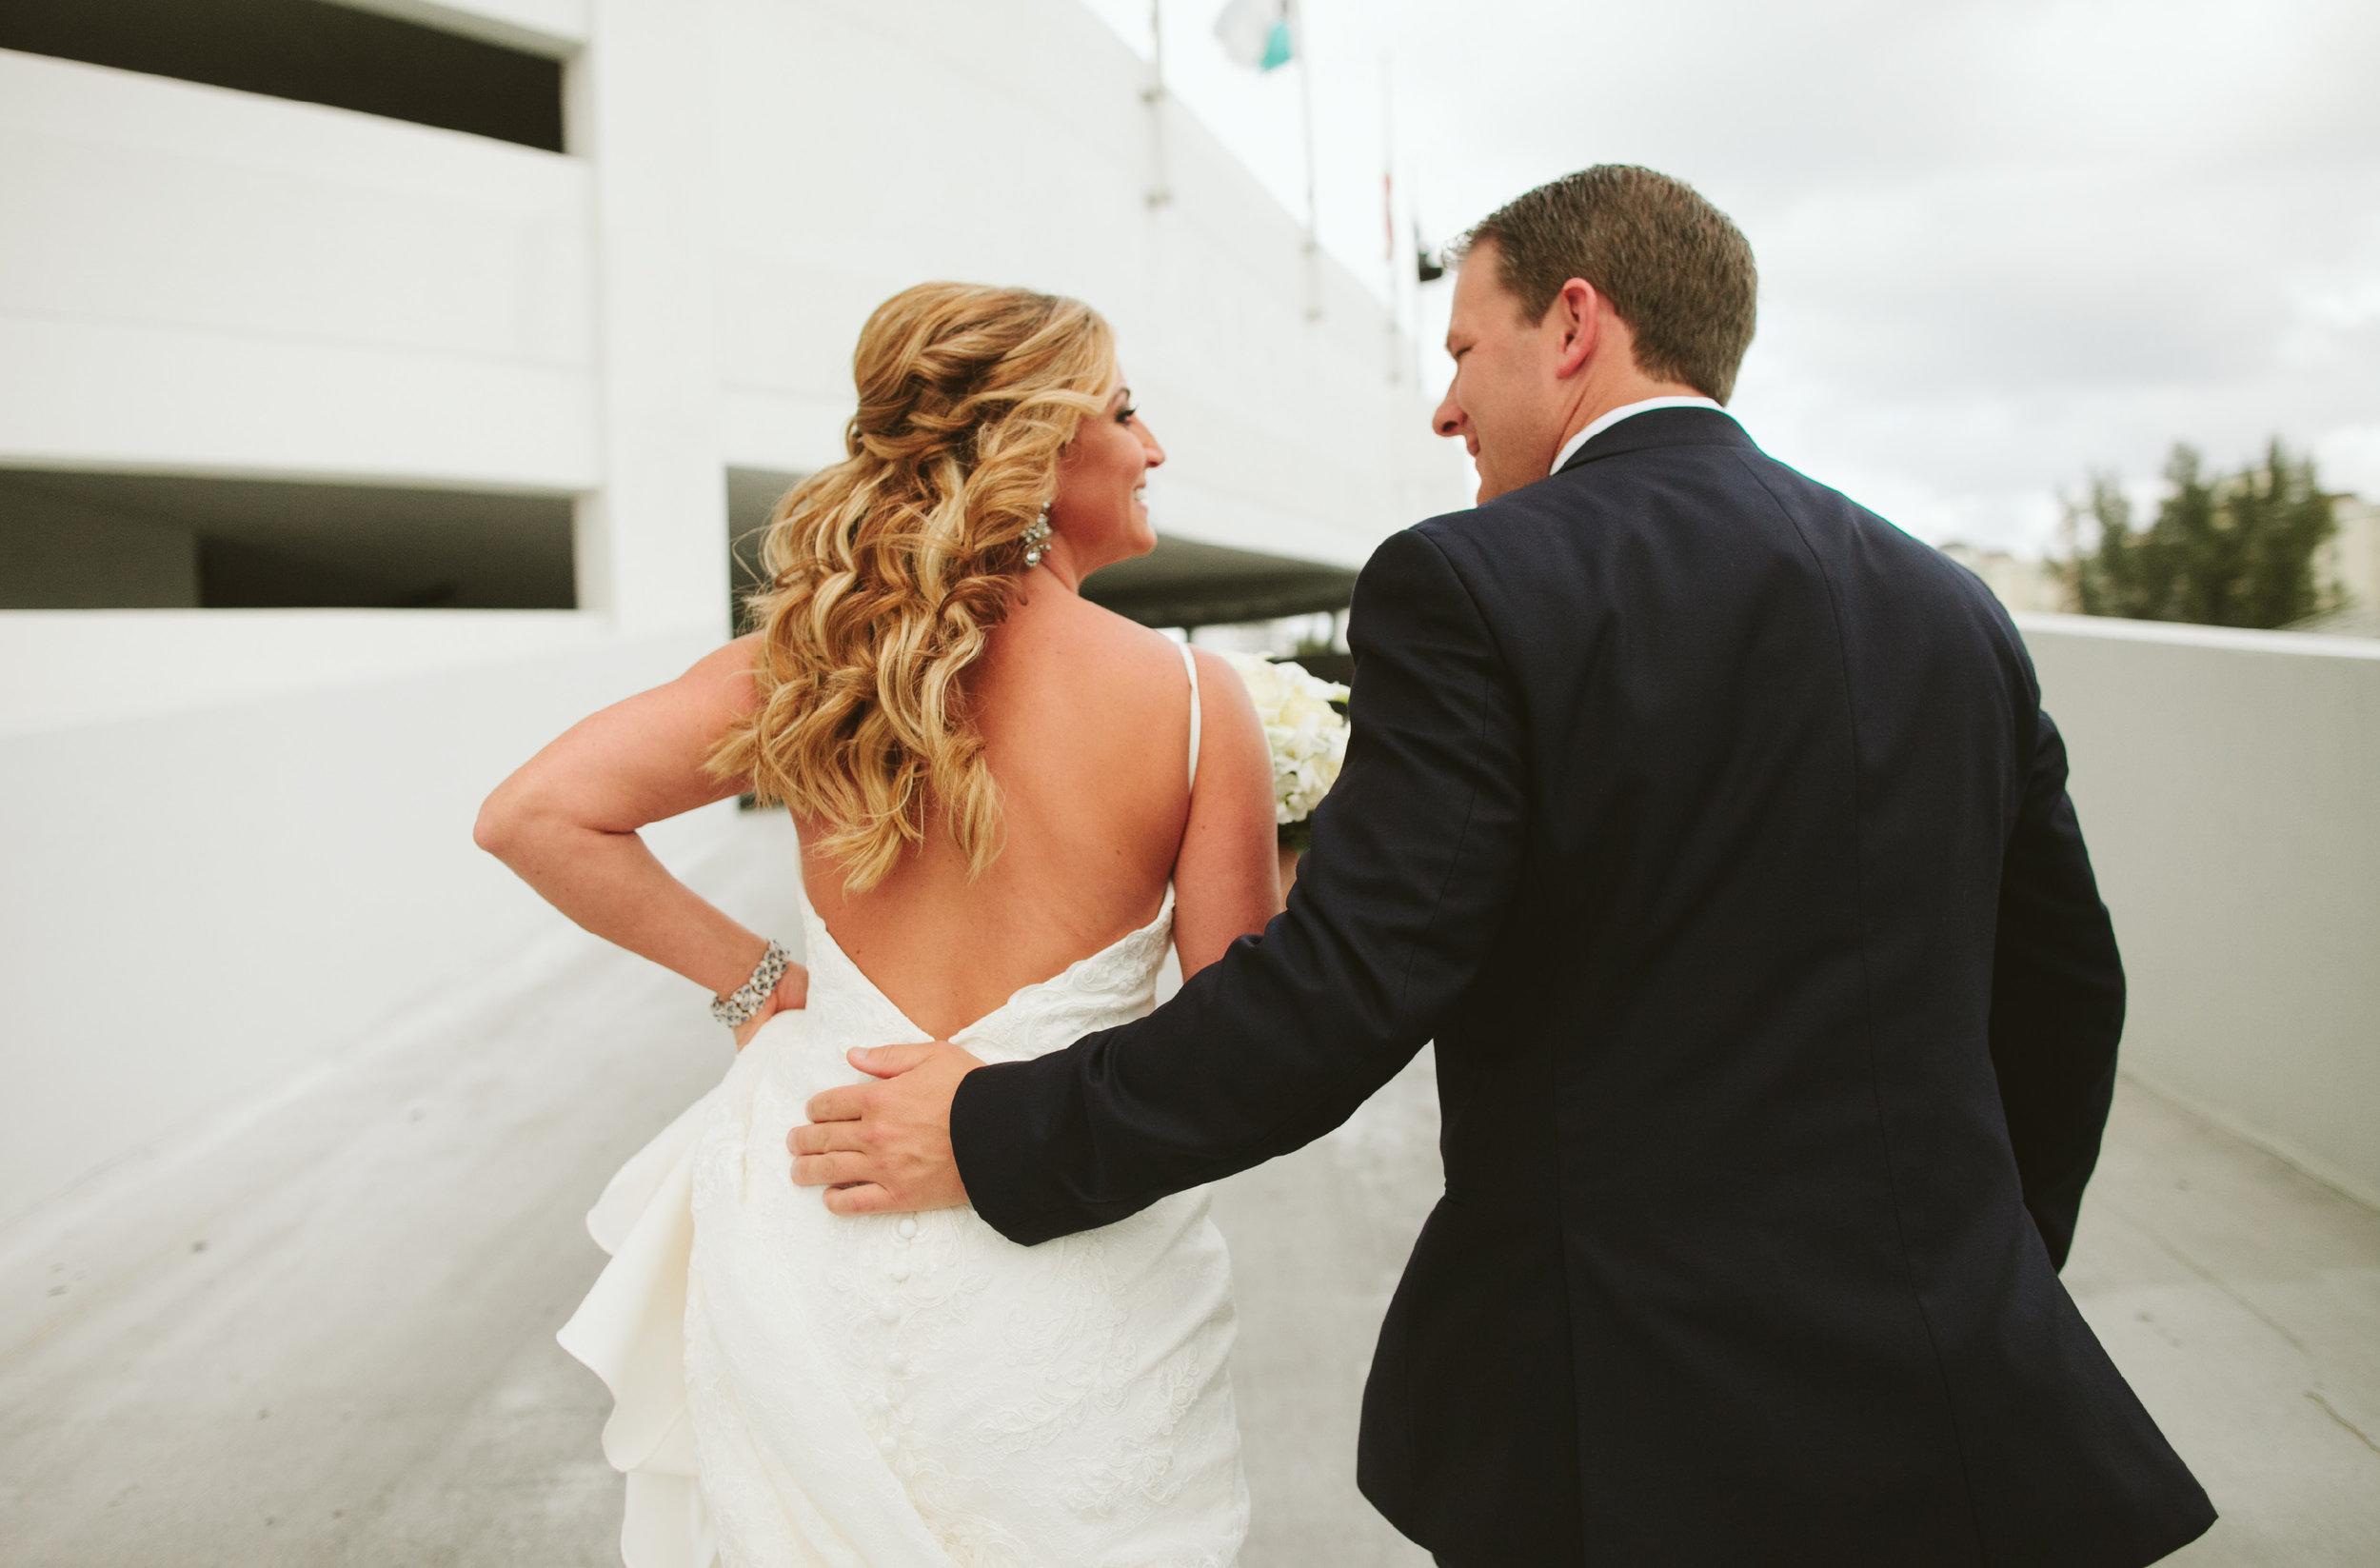 Kim + John's Wedding at the Waterstone Hotel in Boca Raton28.jpg